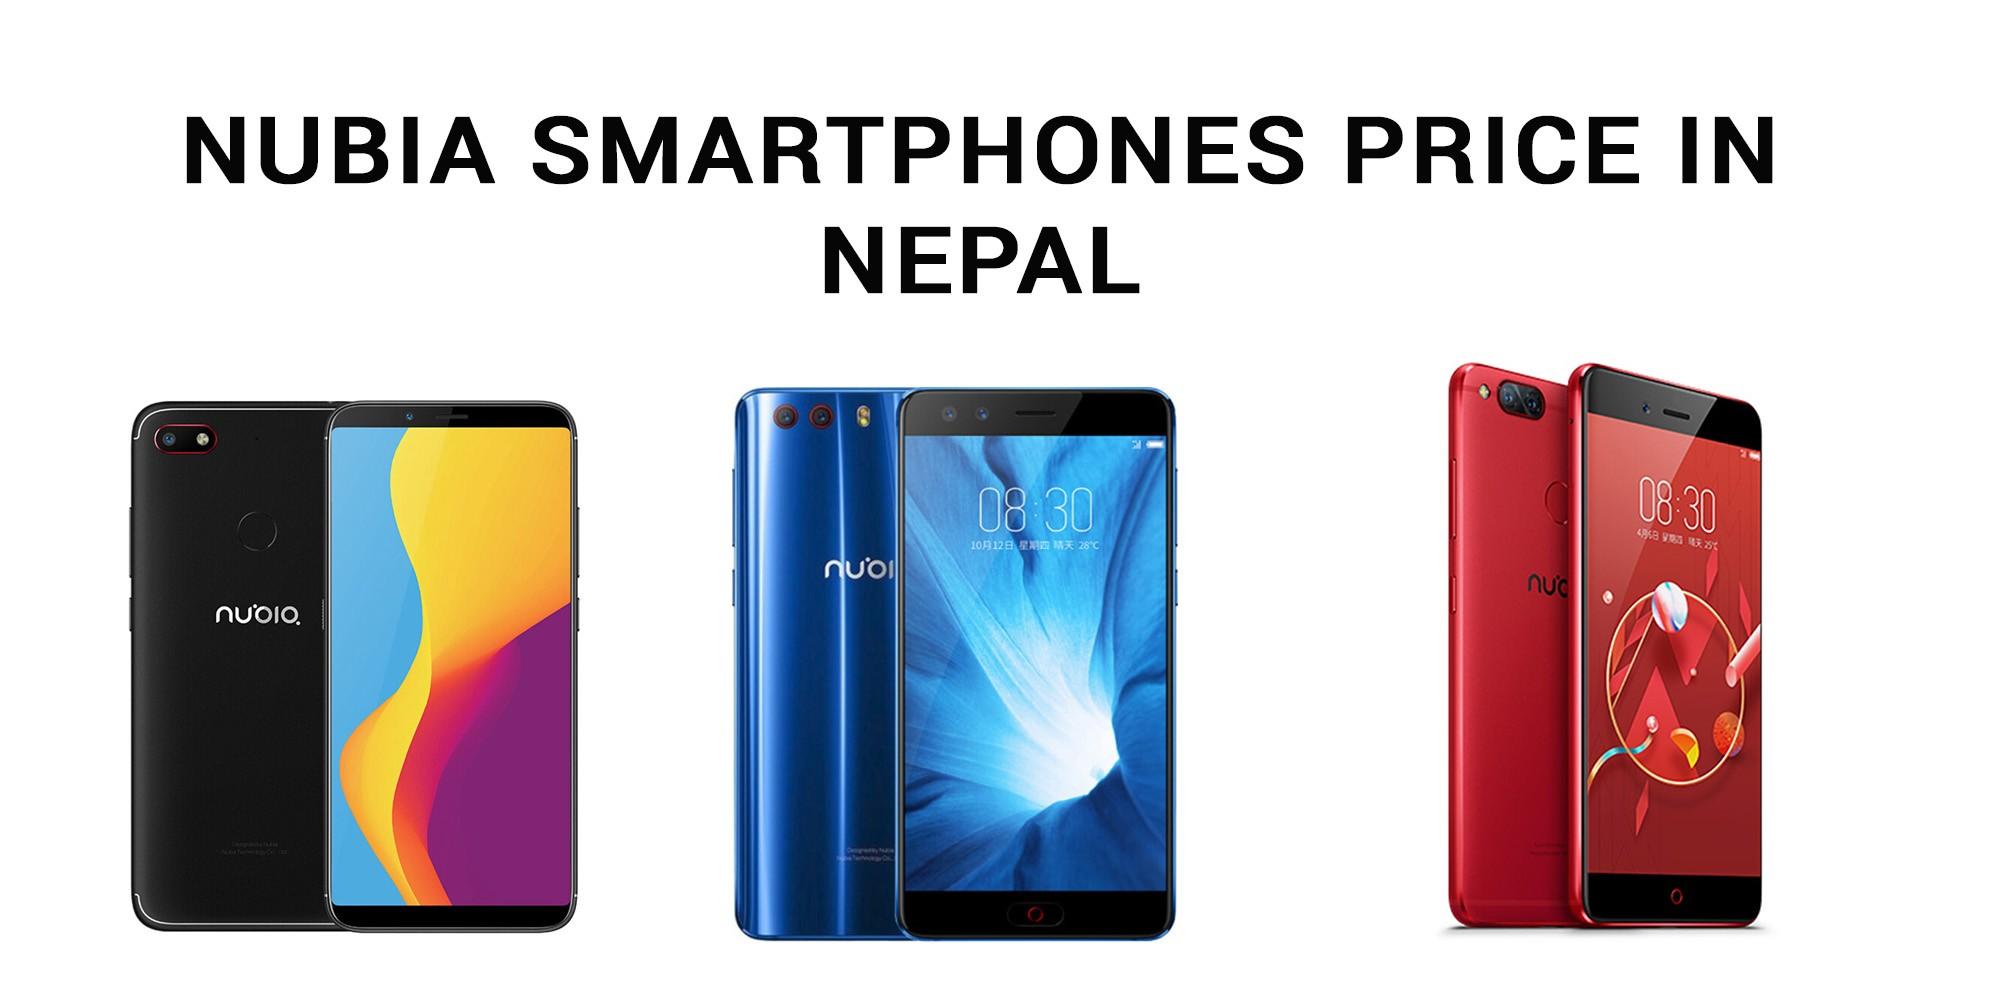 Nubia smartphones price in Nepal